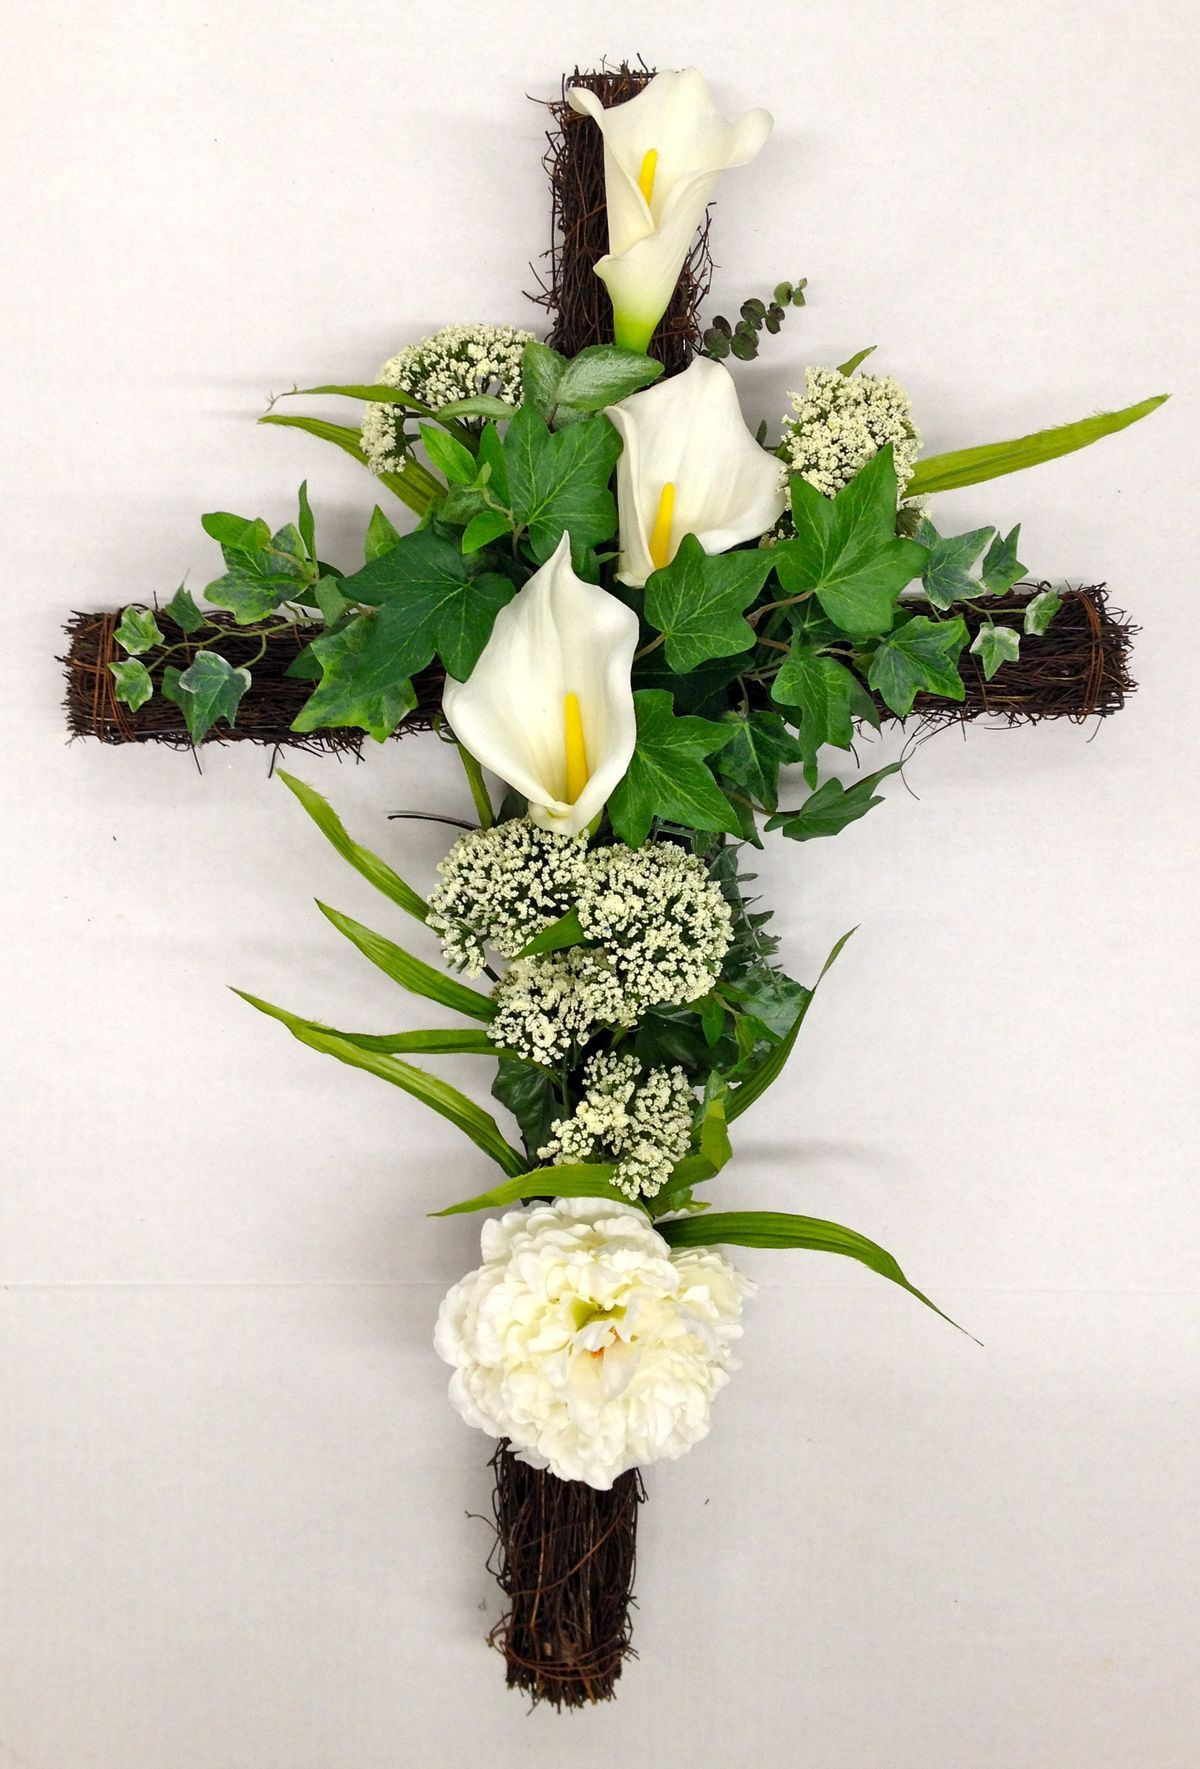 B13c43e79124bb651e55e1484154432dg 12001769 pixels diy spring 2014 season memorial grape vine cross with white calla lilies and wild izmirmasajfo Image collections